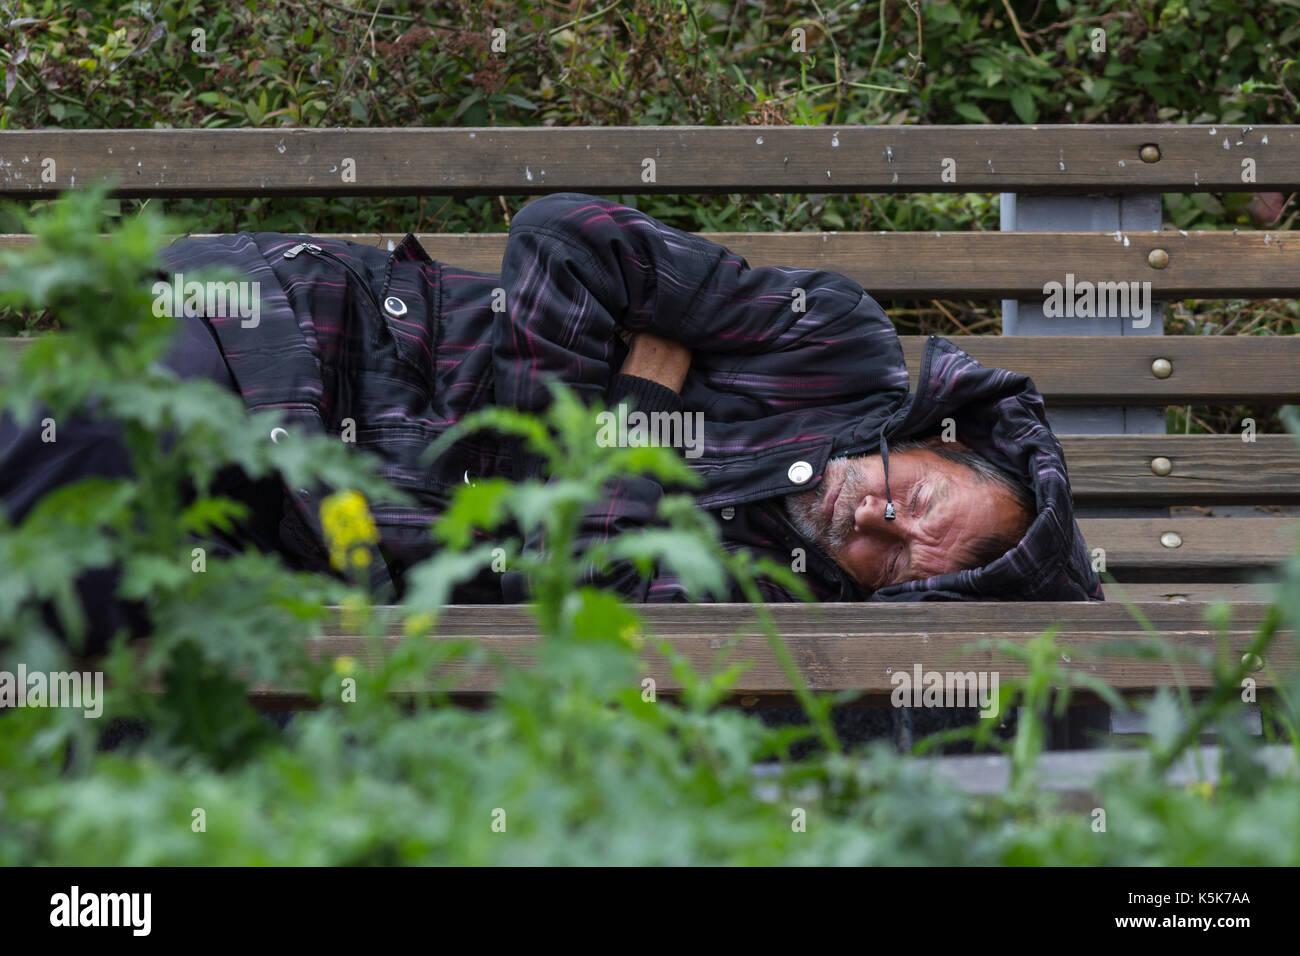 KAZAN, RUSSIA - 9 SEPTEMBER 2017: homeless alcoholic beggar man is sleeping on bench in park - Stock Image